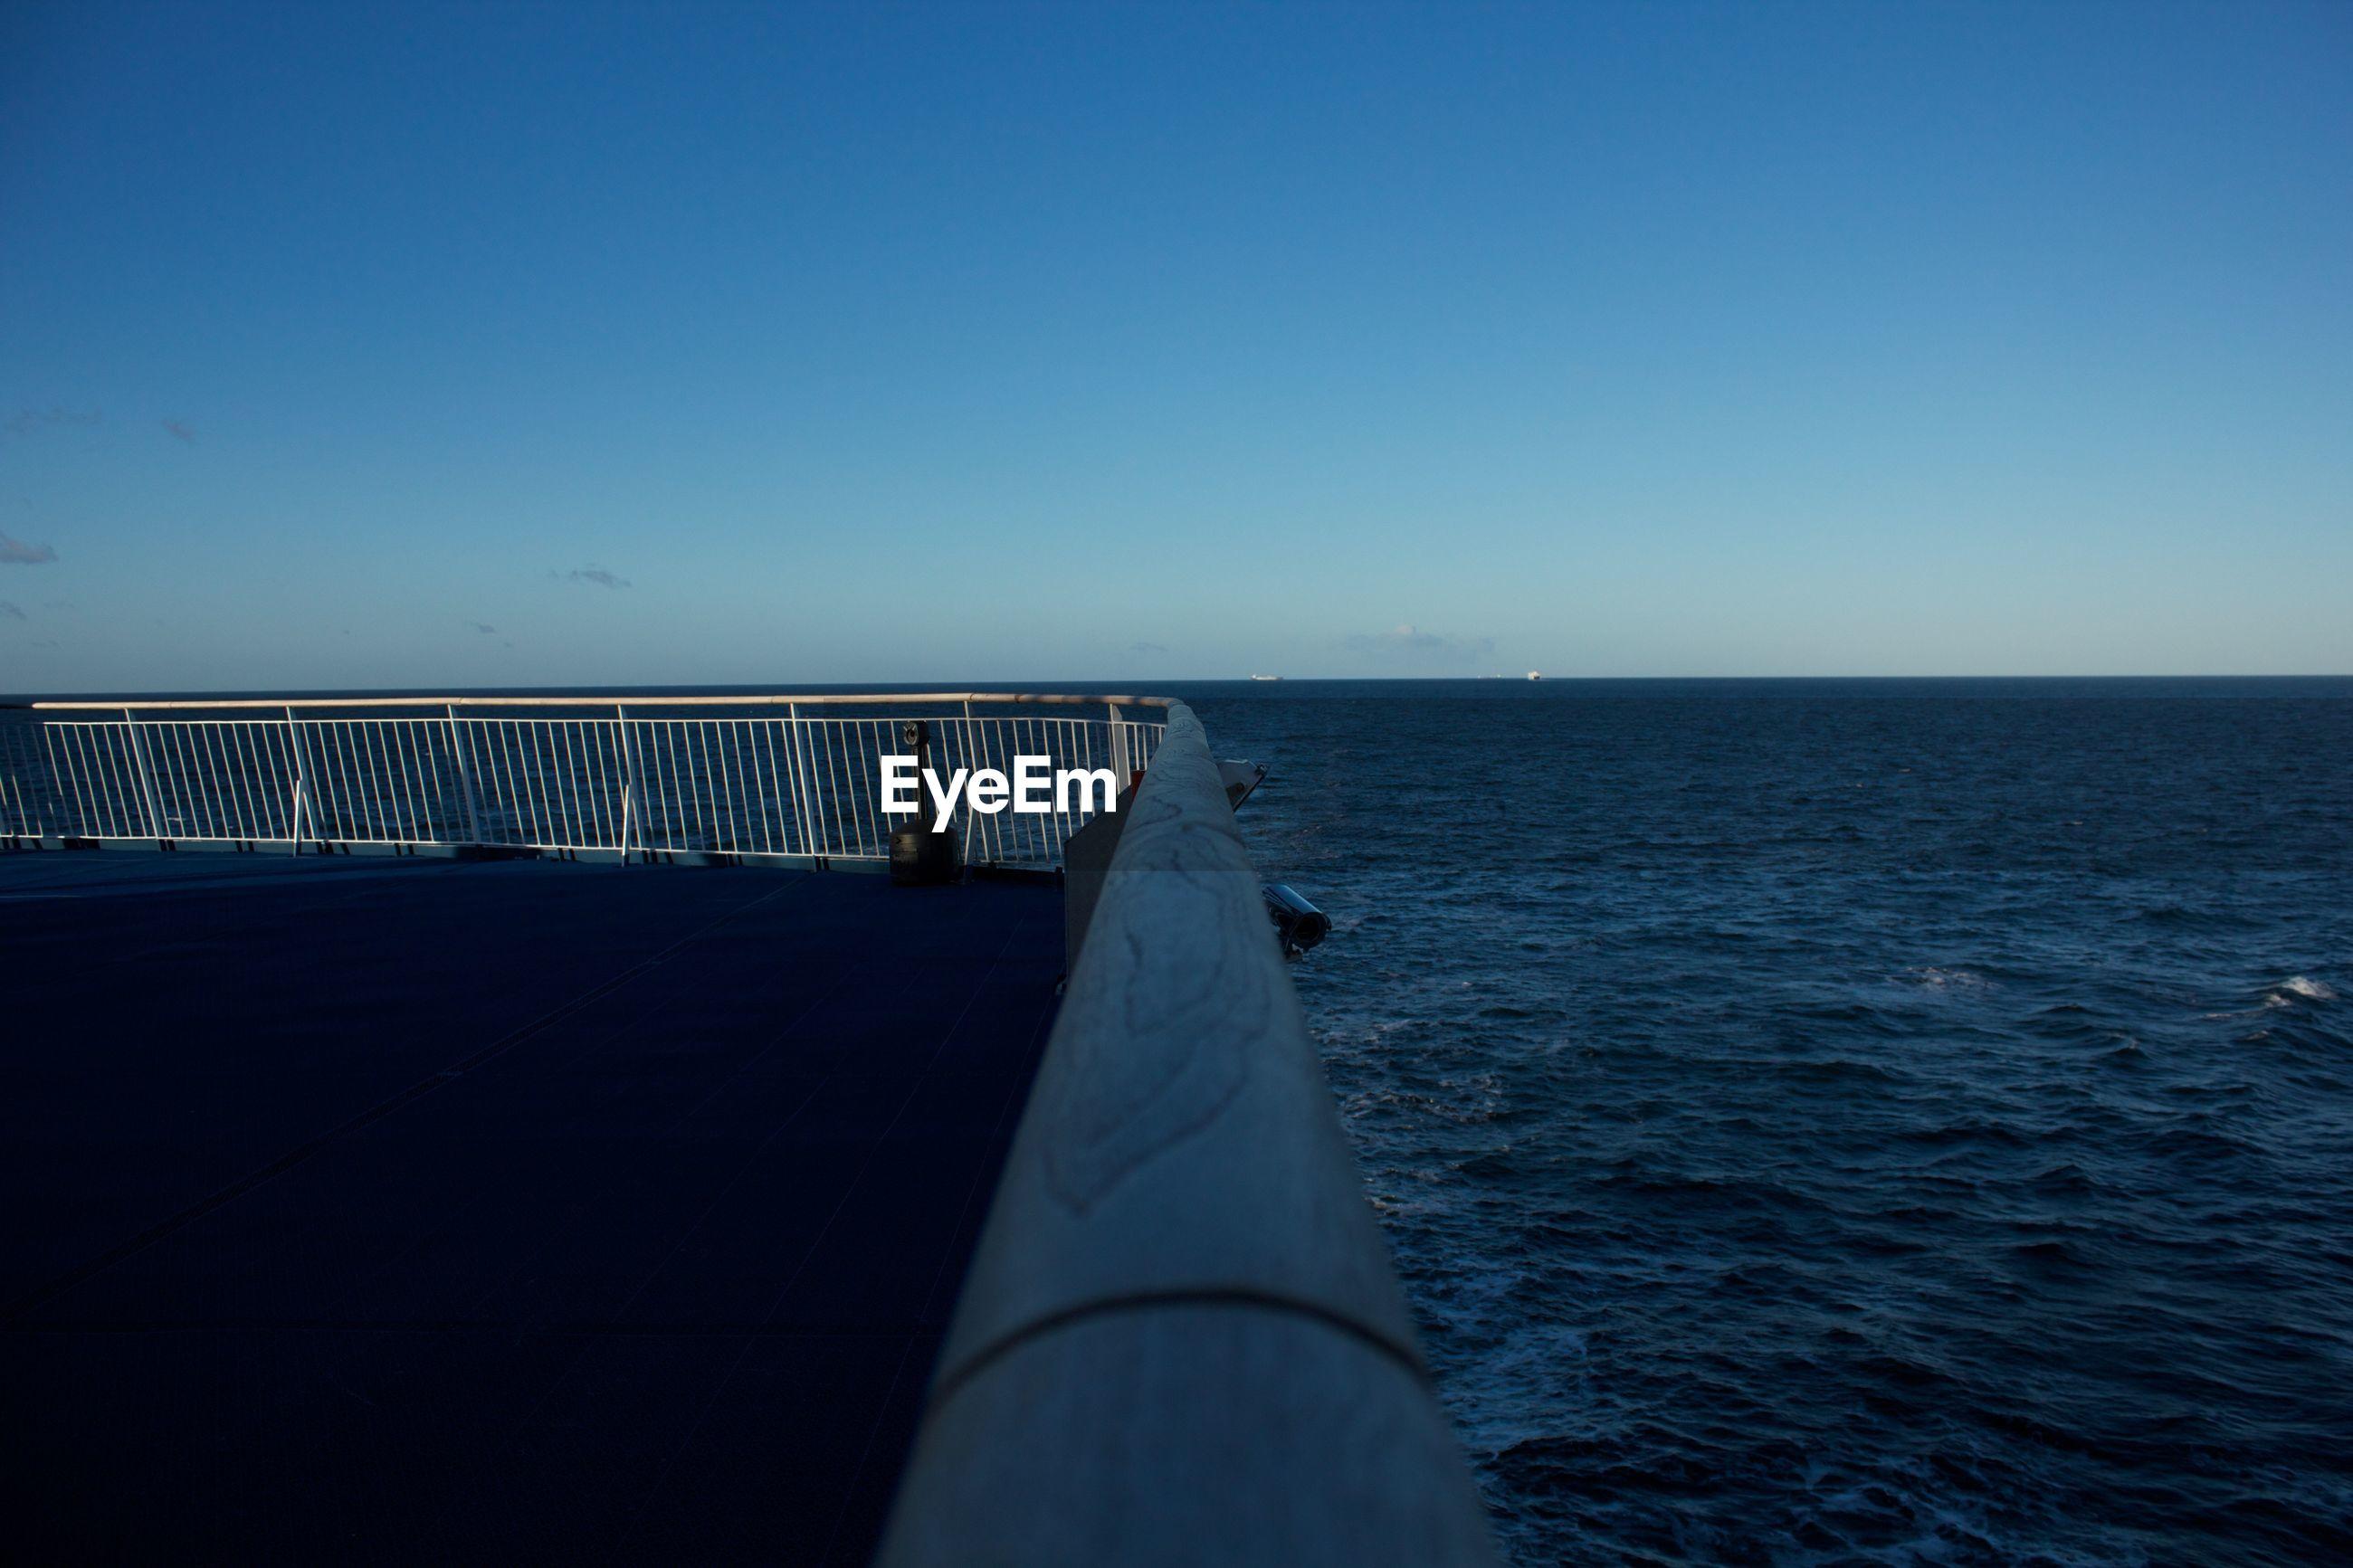 SEA AGAINST CLEAR BLUE SKY